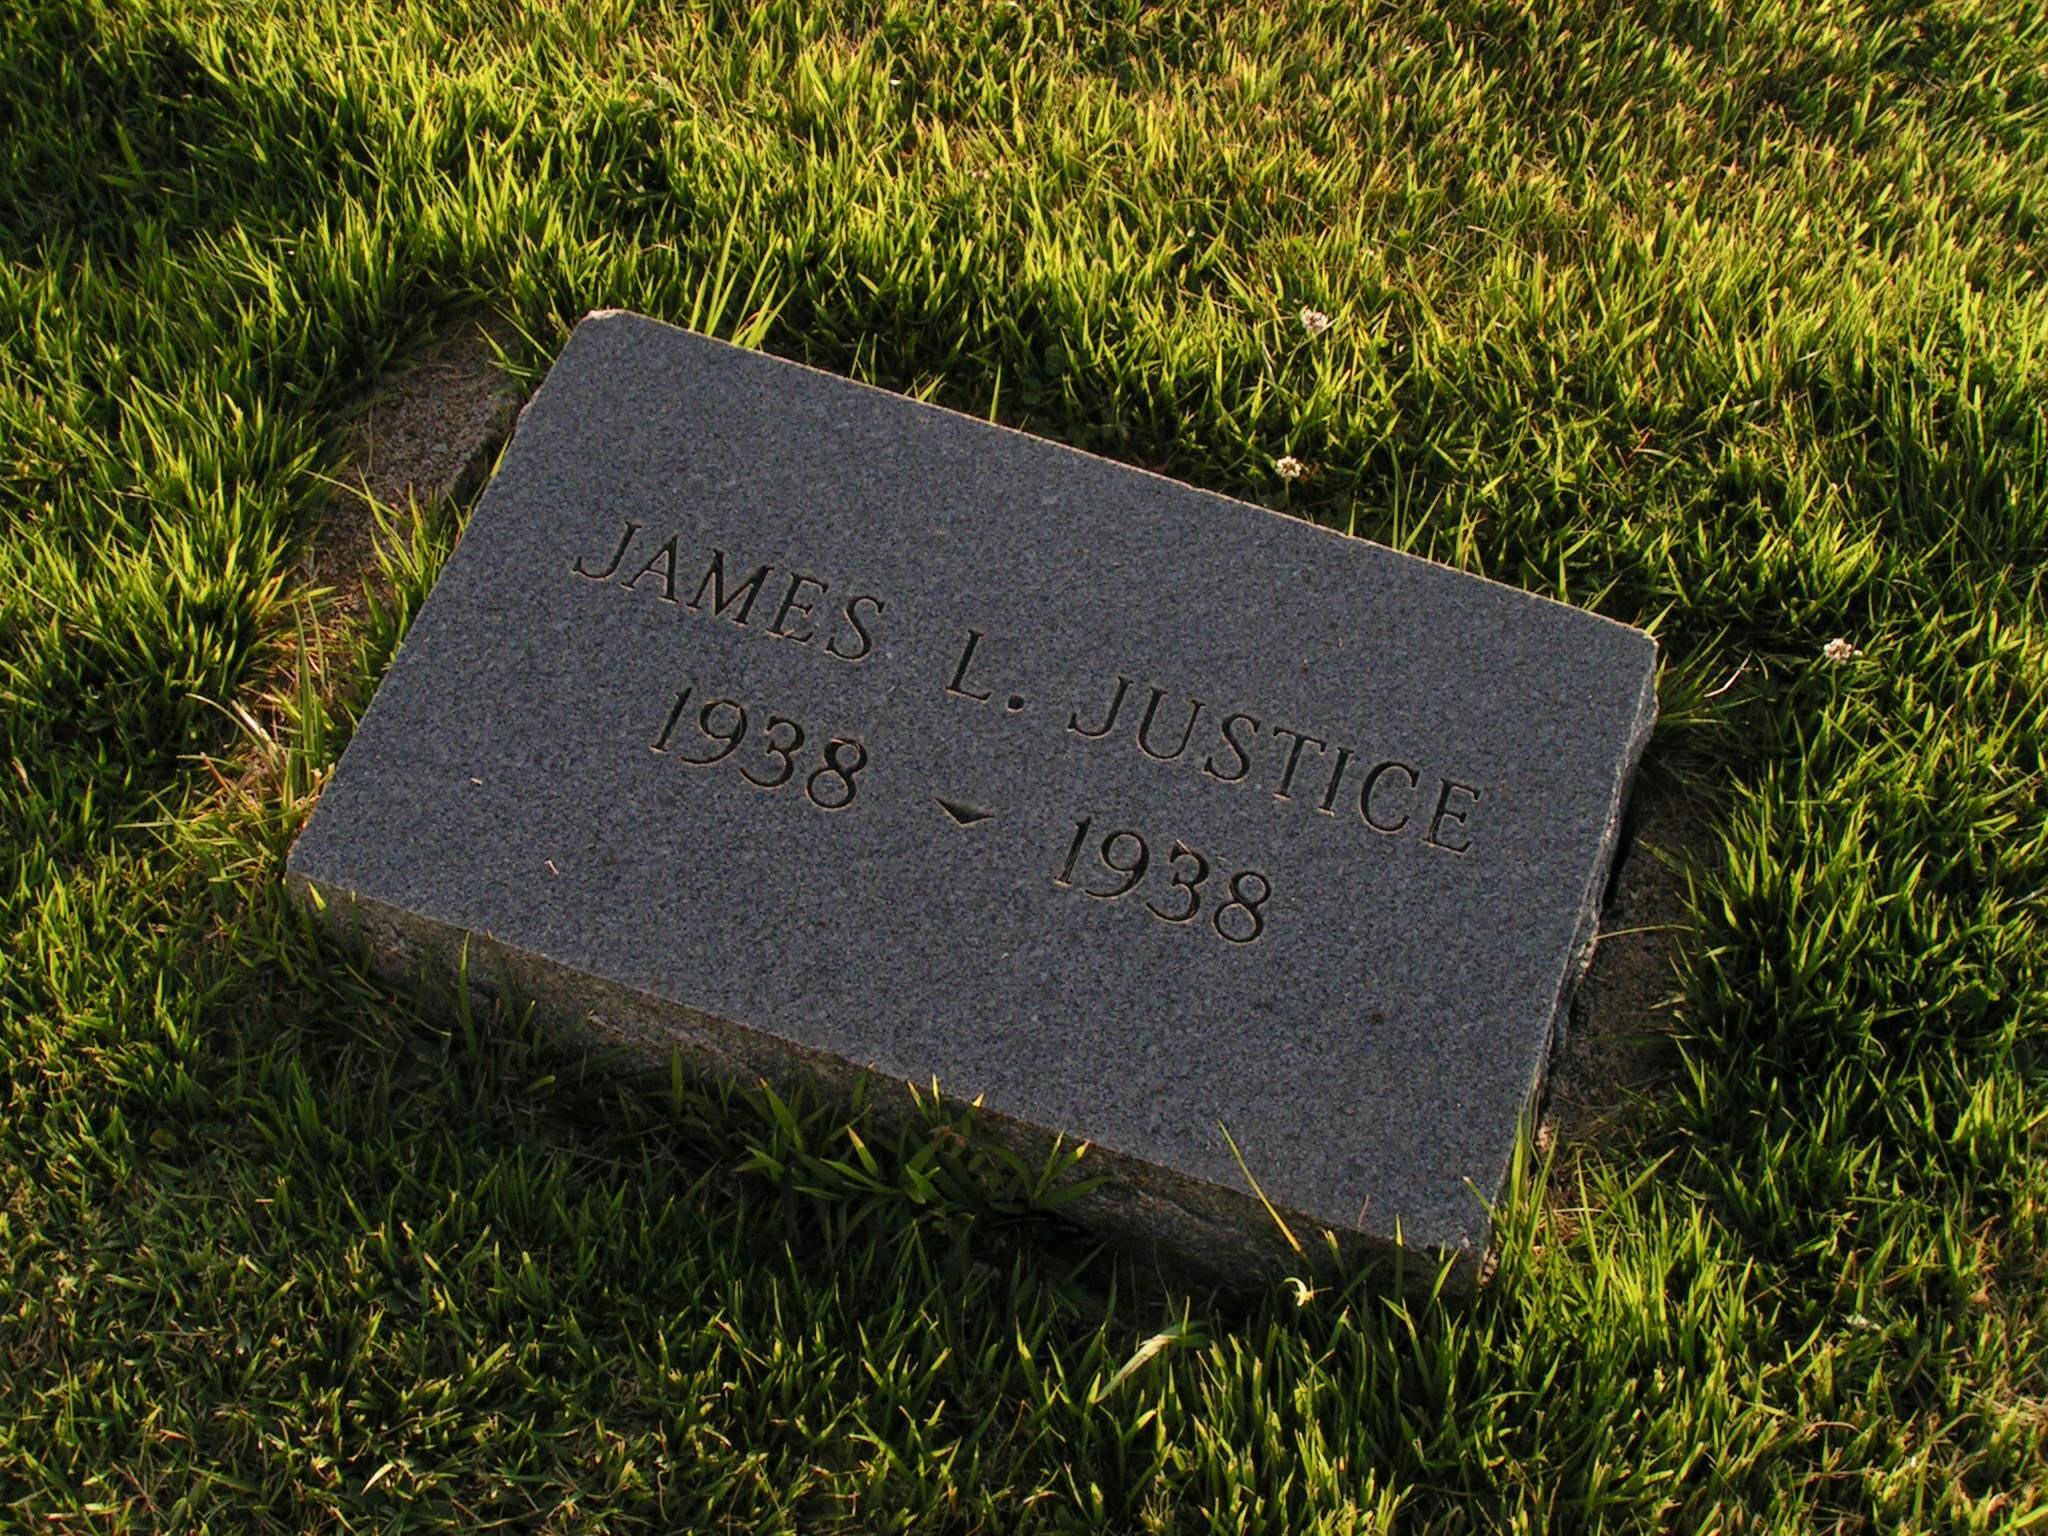 James L Justice